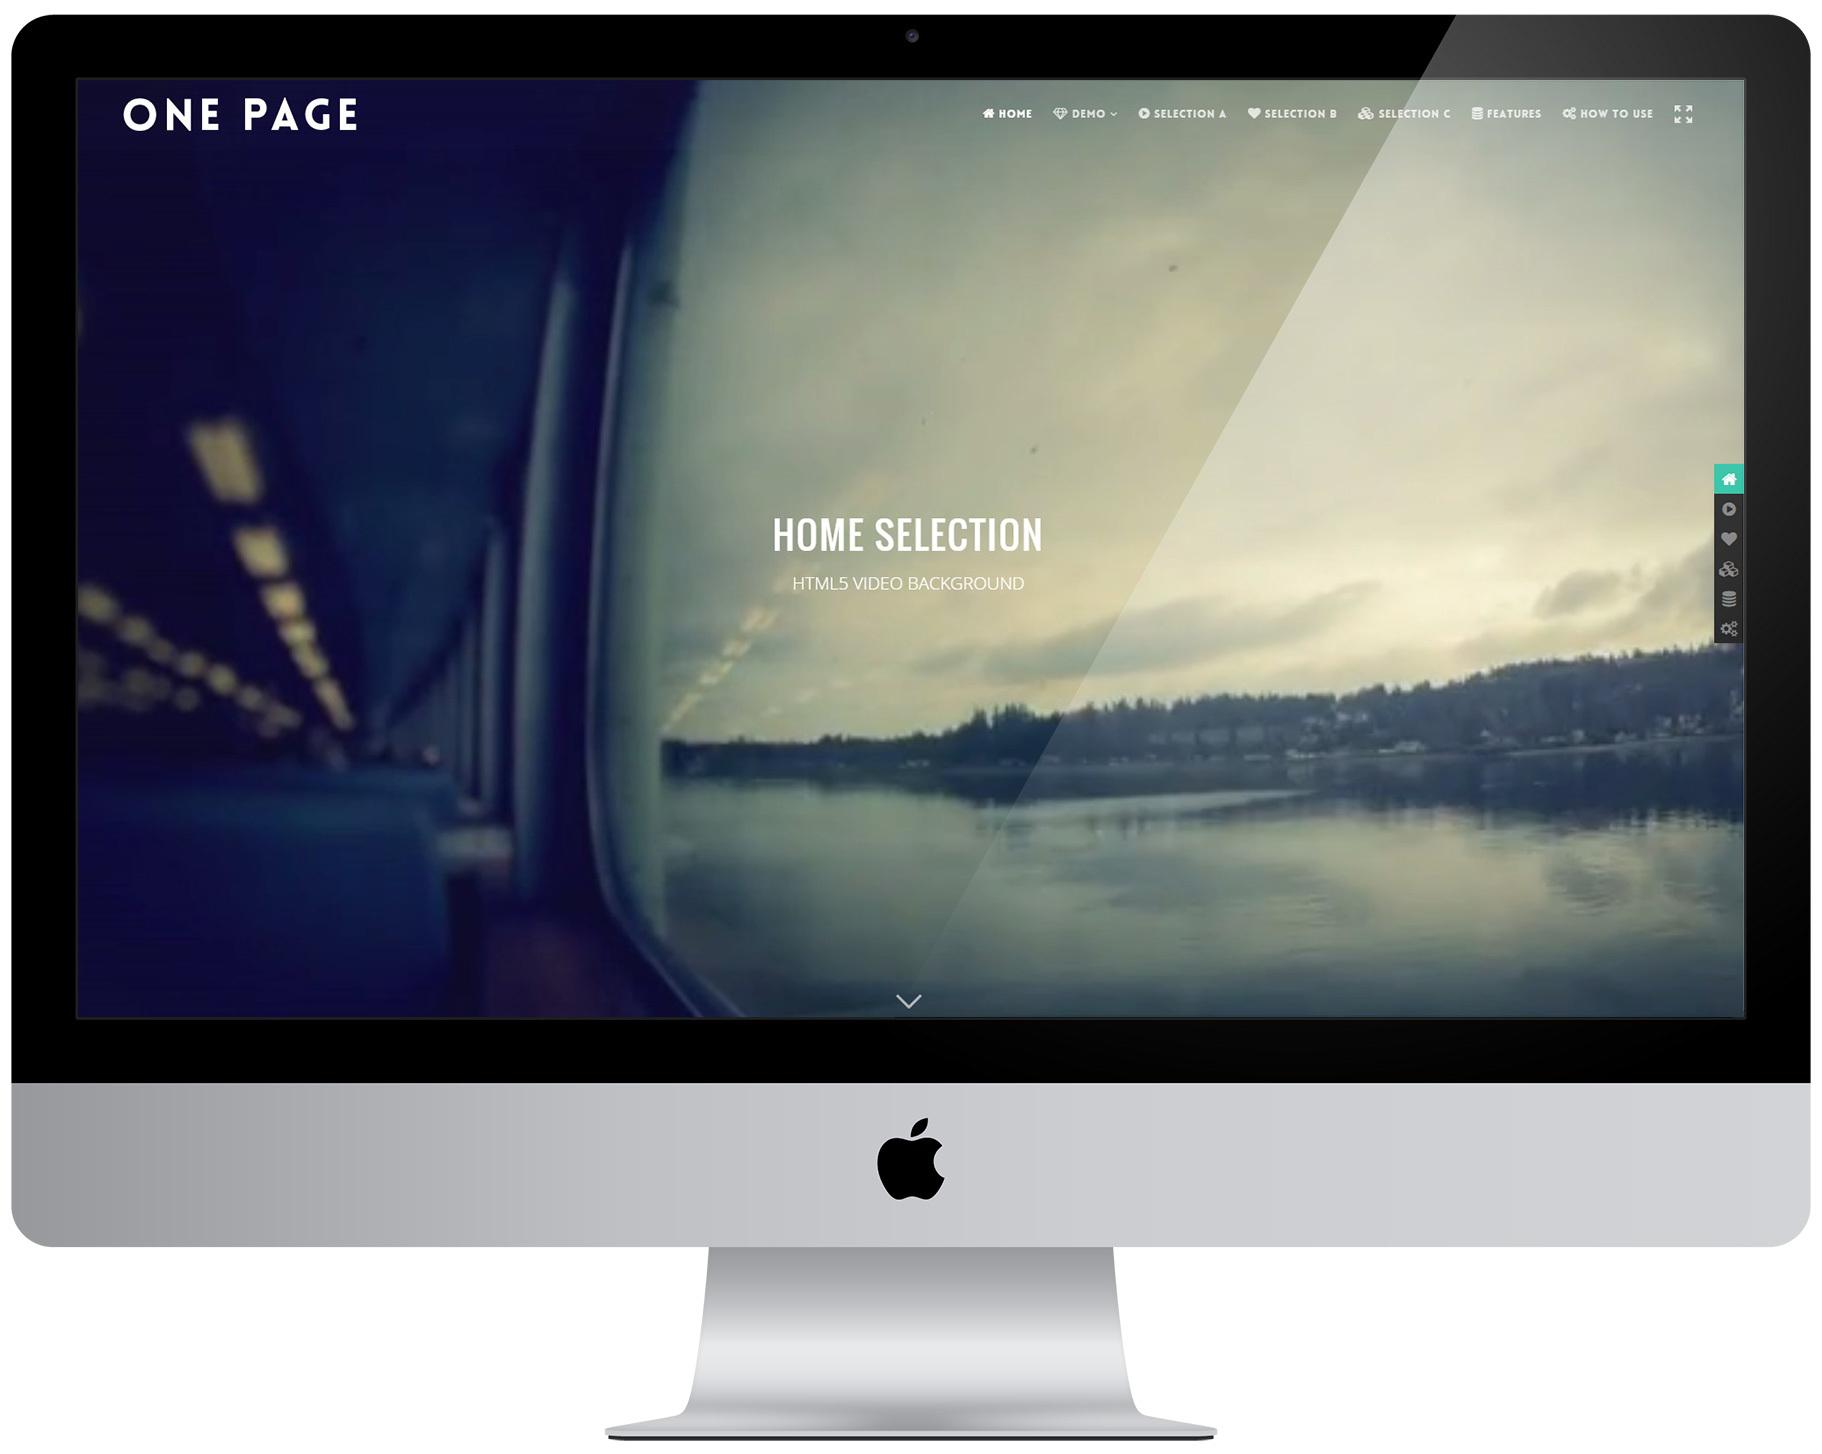 Smart One Page Navigation - Addon For Visual Composer